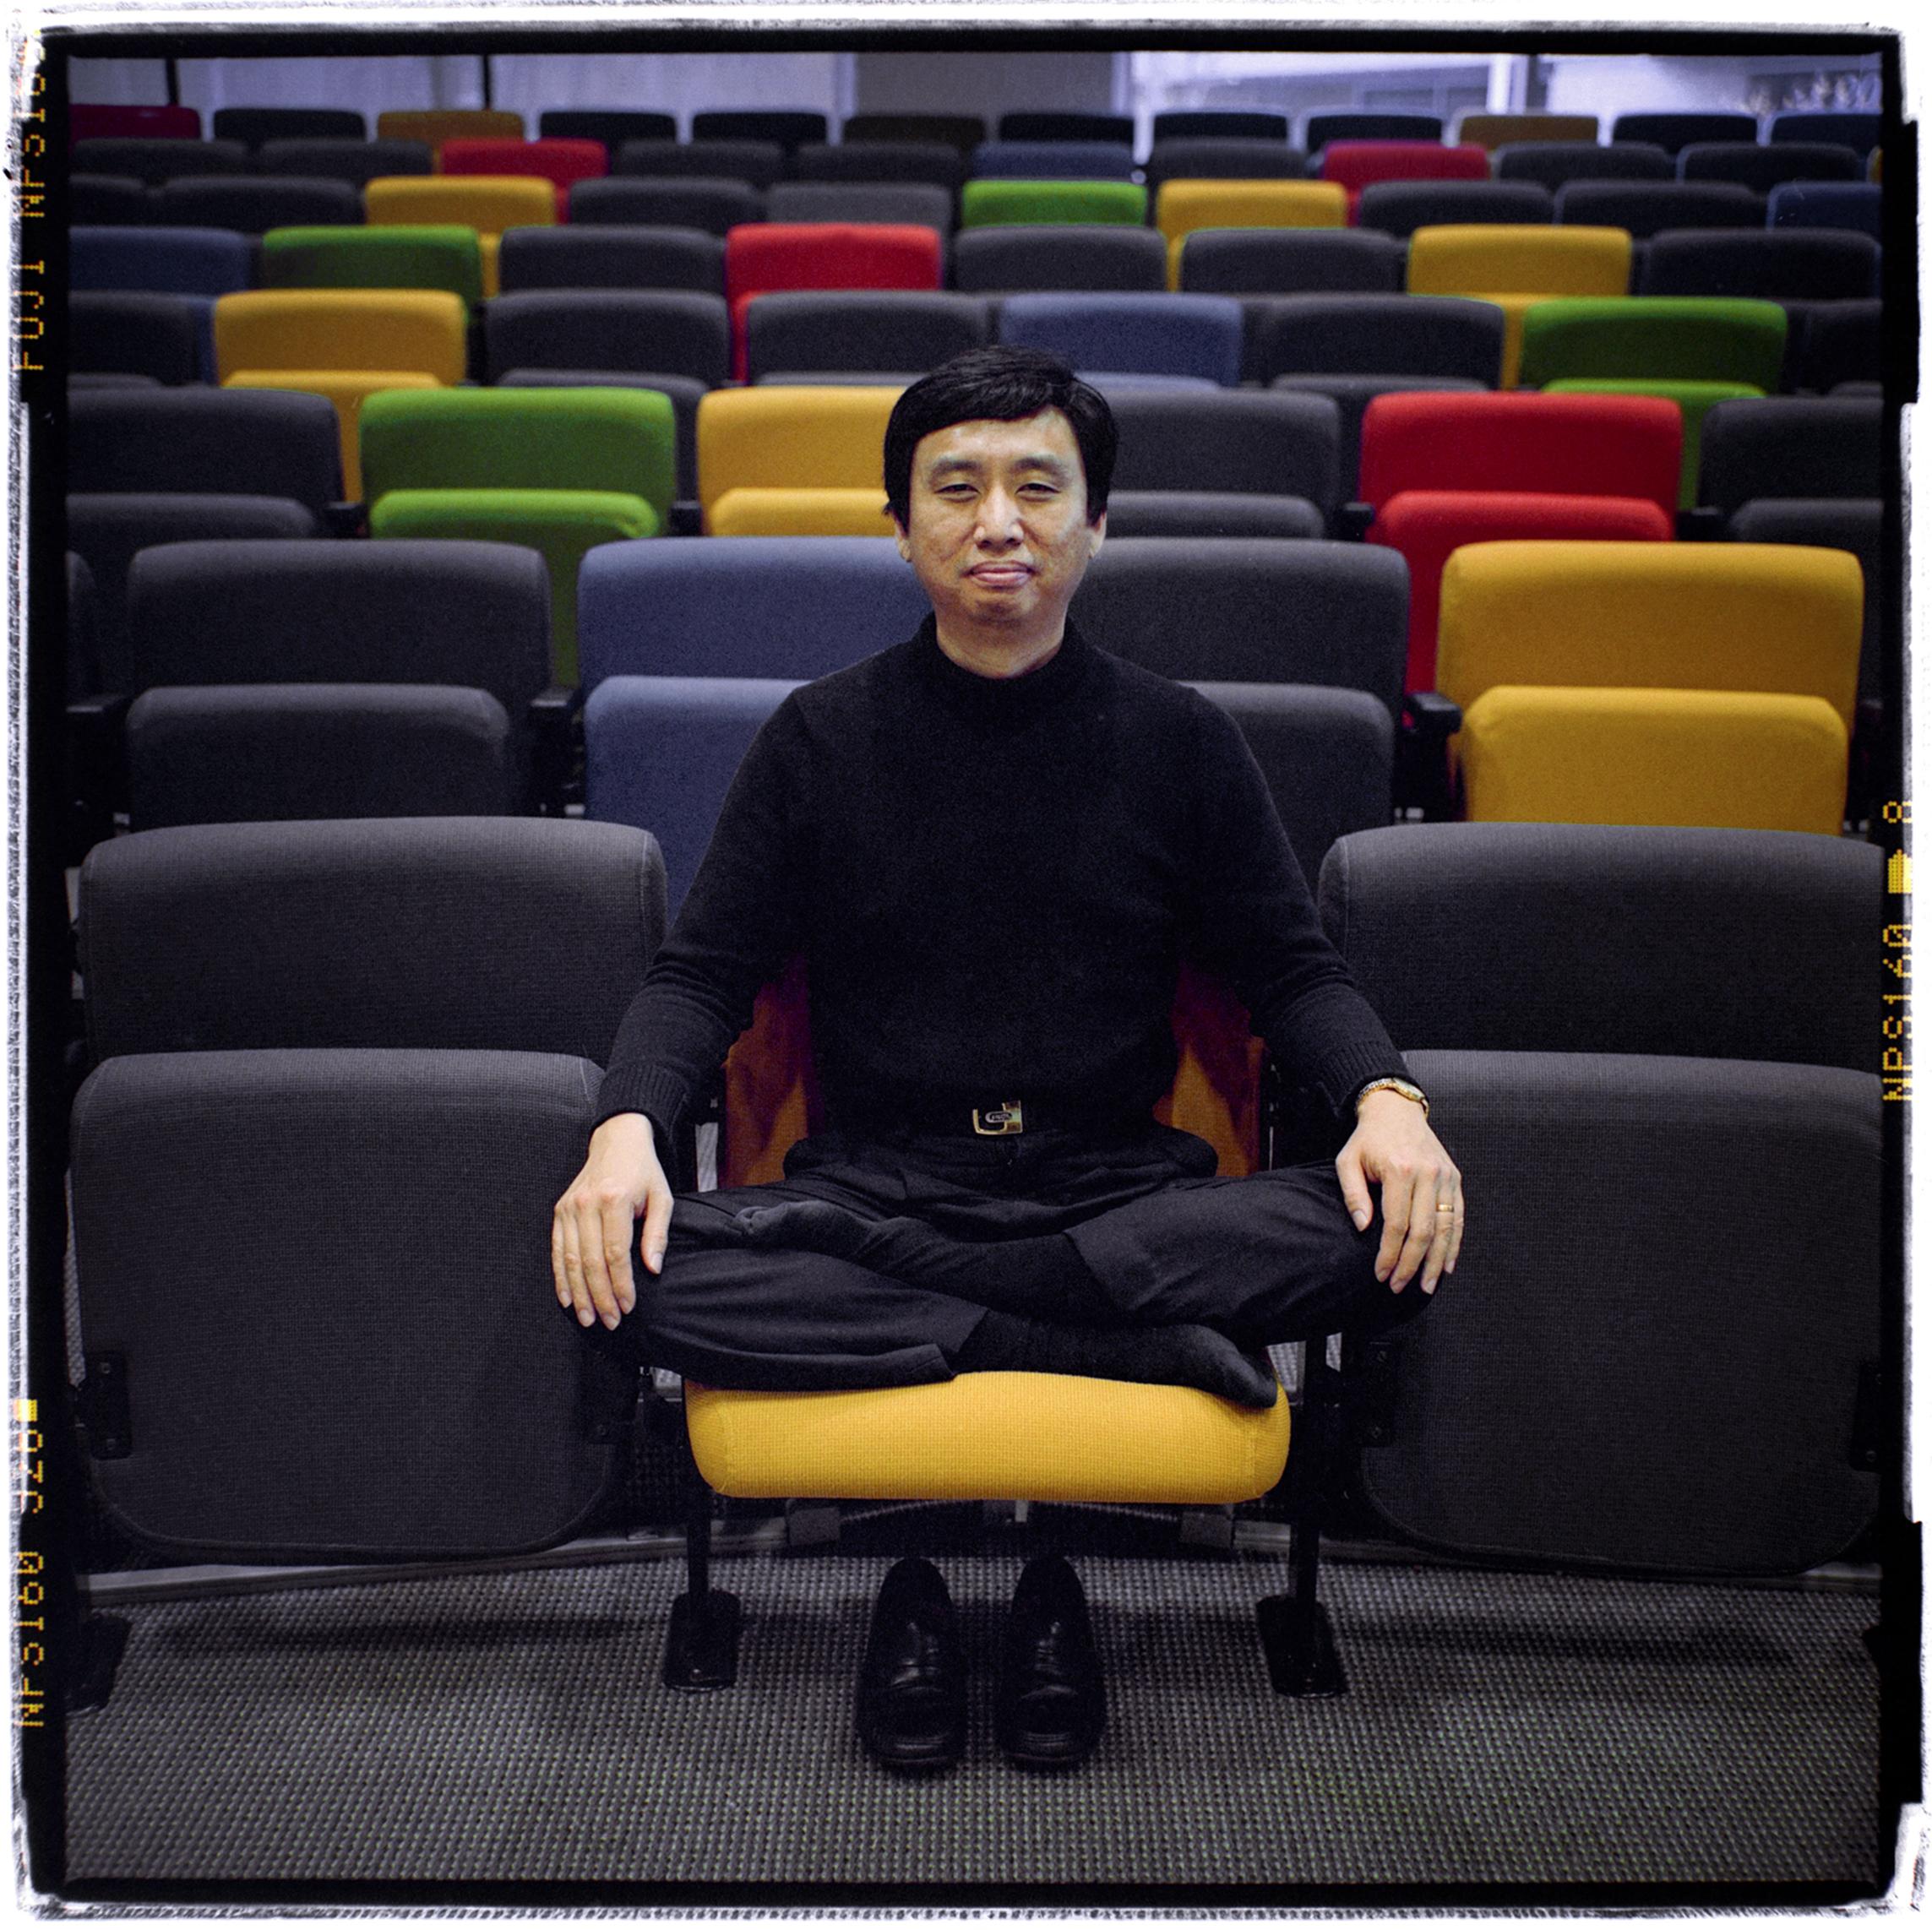 Chade -  Meng  Tan  - Google 's Jolly Good Fellow